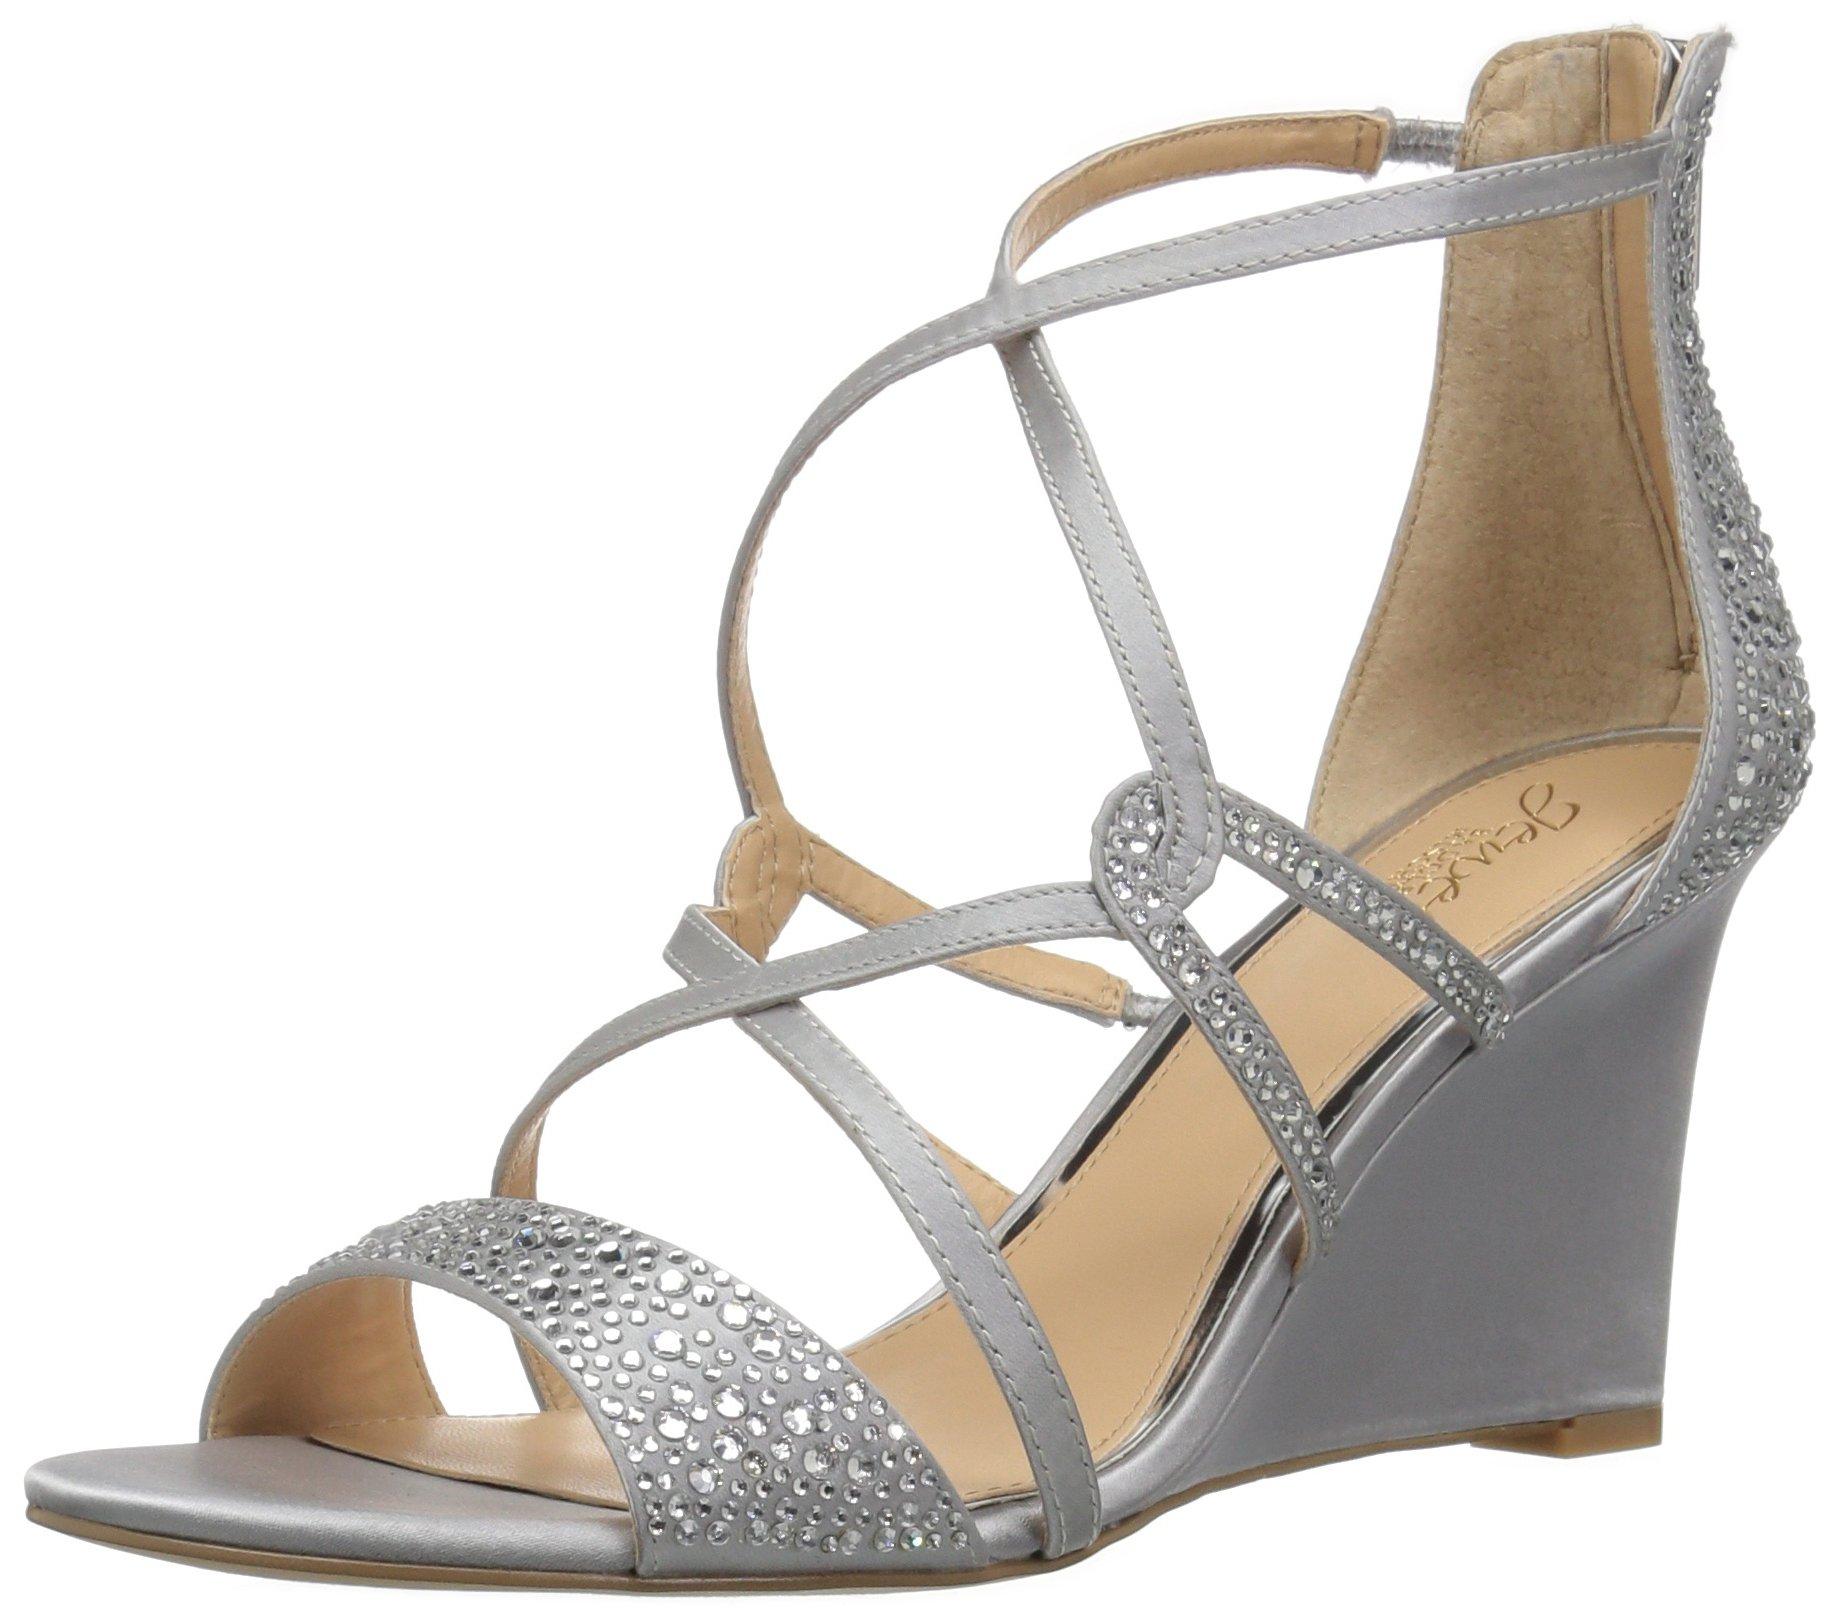 Badgley Mischka Jewel Women's Ally II Wedge Sandal, Silver, 8 Medium US